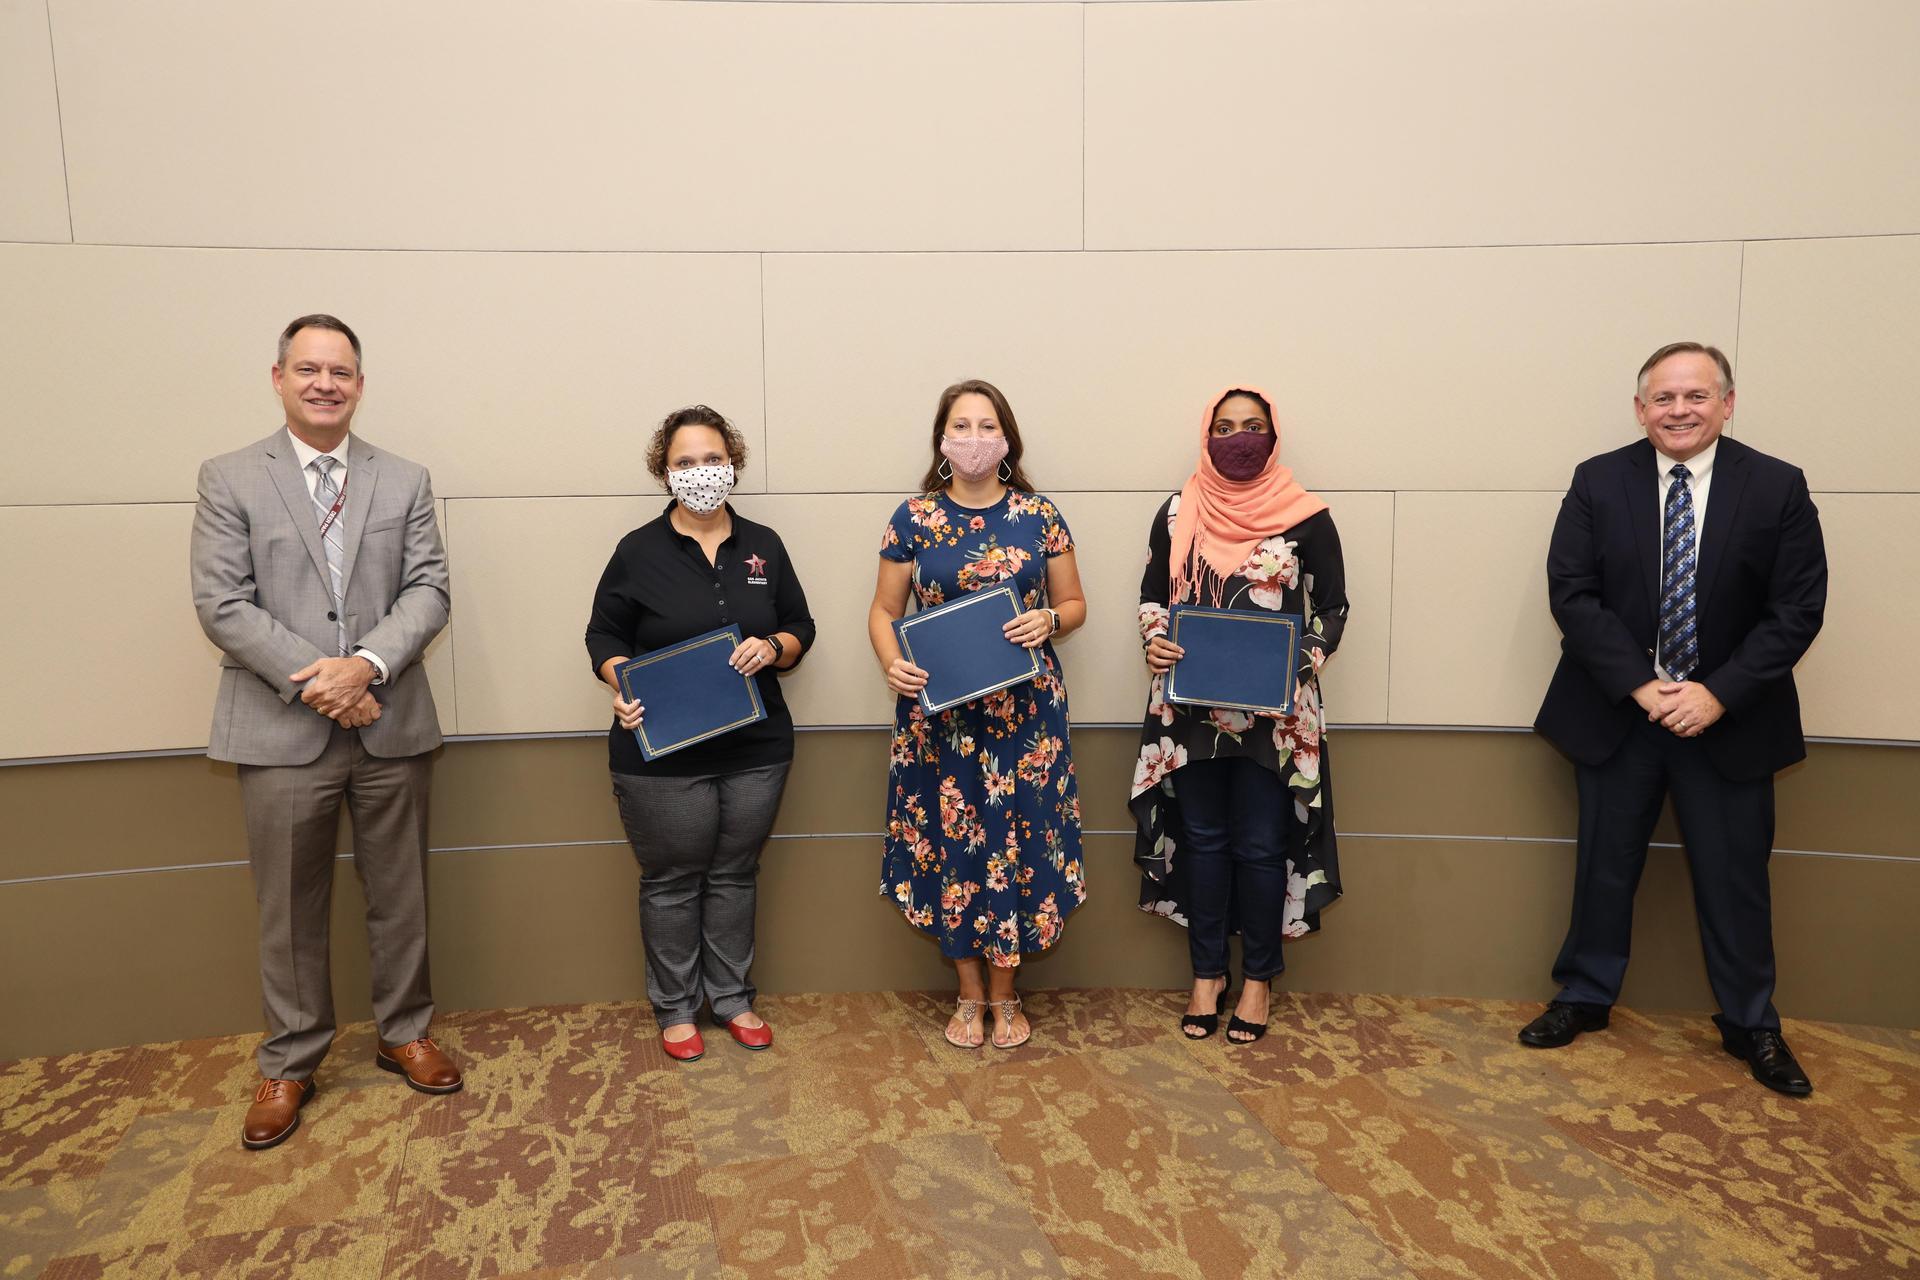 Shell Science Lab Regional Challenge winners